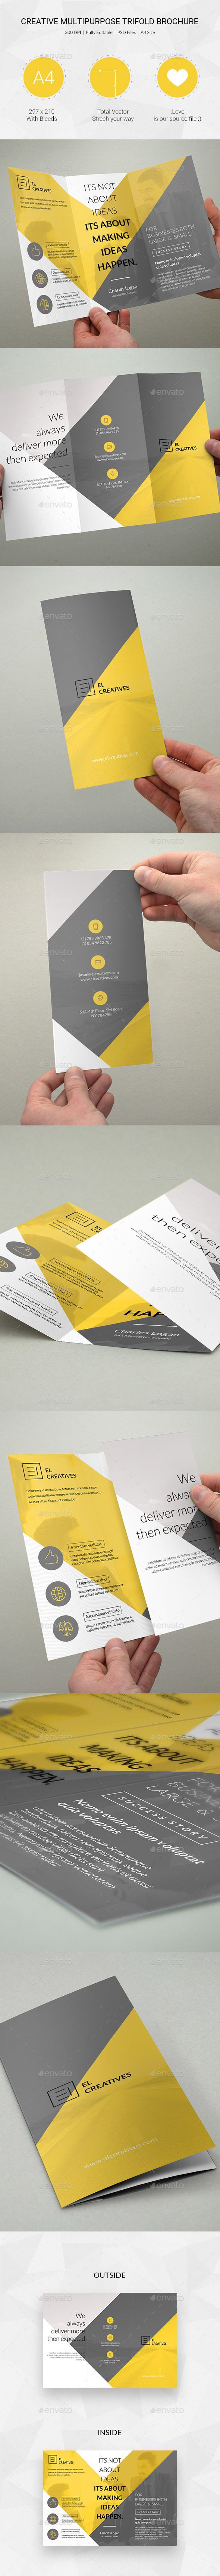 Creative Multipurpose Trifold Brochure Template PSD #design Download: http://graphicriver.net/item/creative-multipurpose-trifold-brochure-20/13337128?ref=ksioks